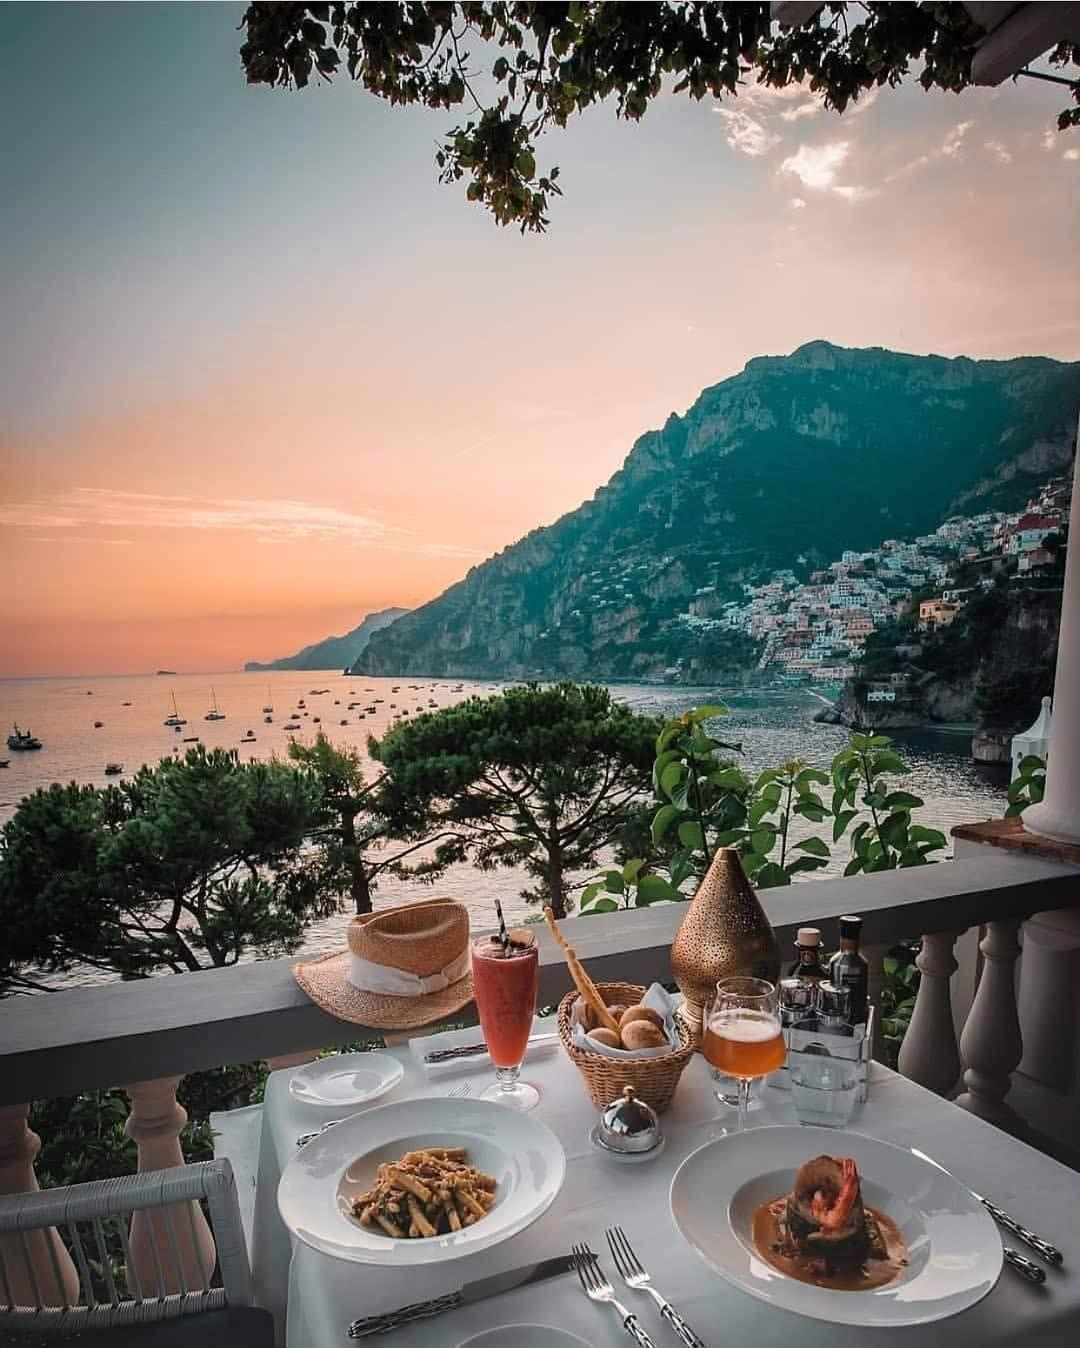 Die besten Restaurants entlang der Amalfiküste | Italien